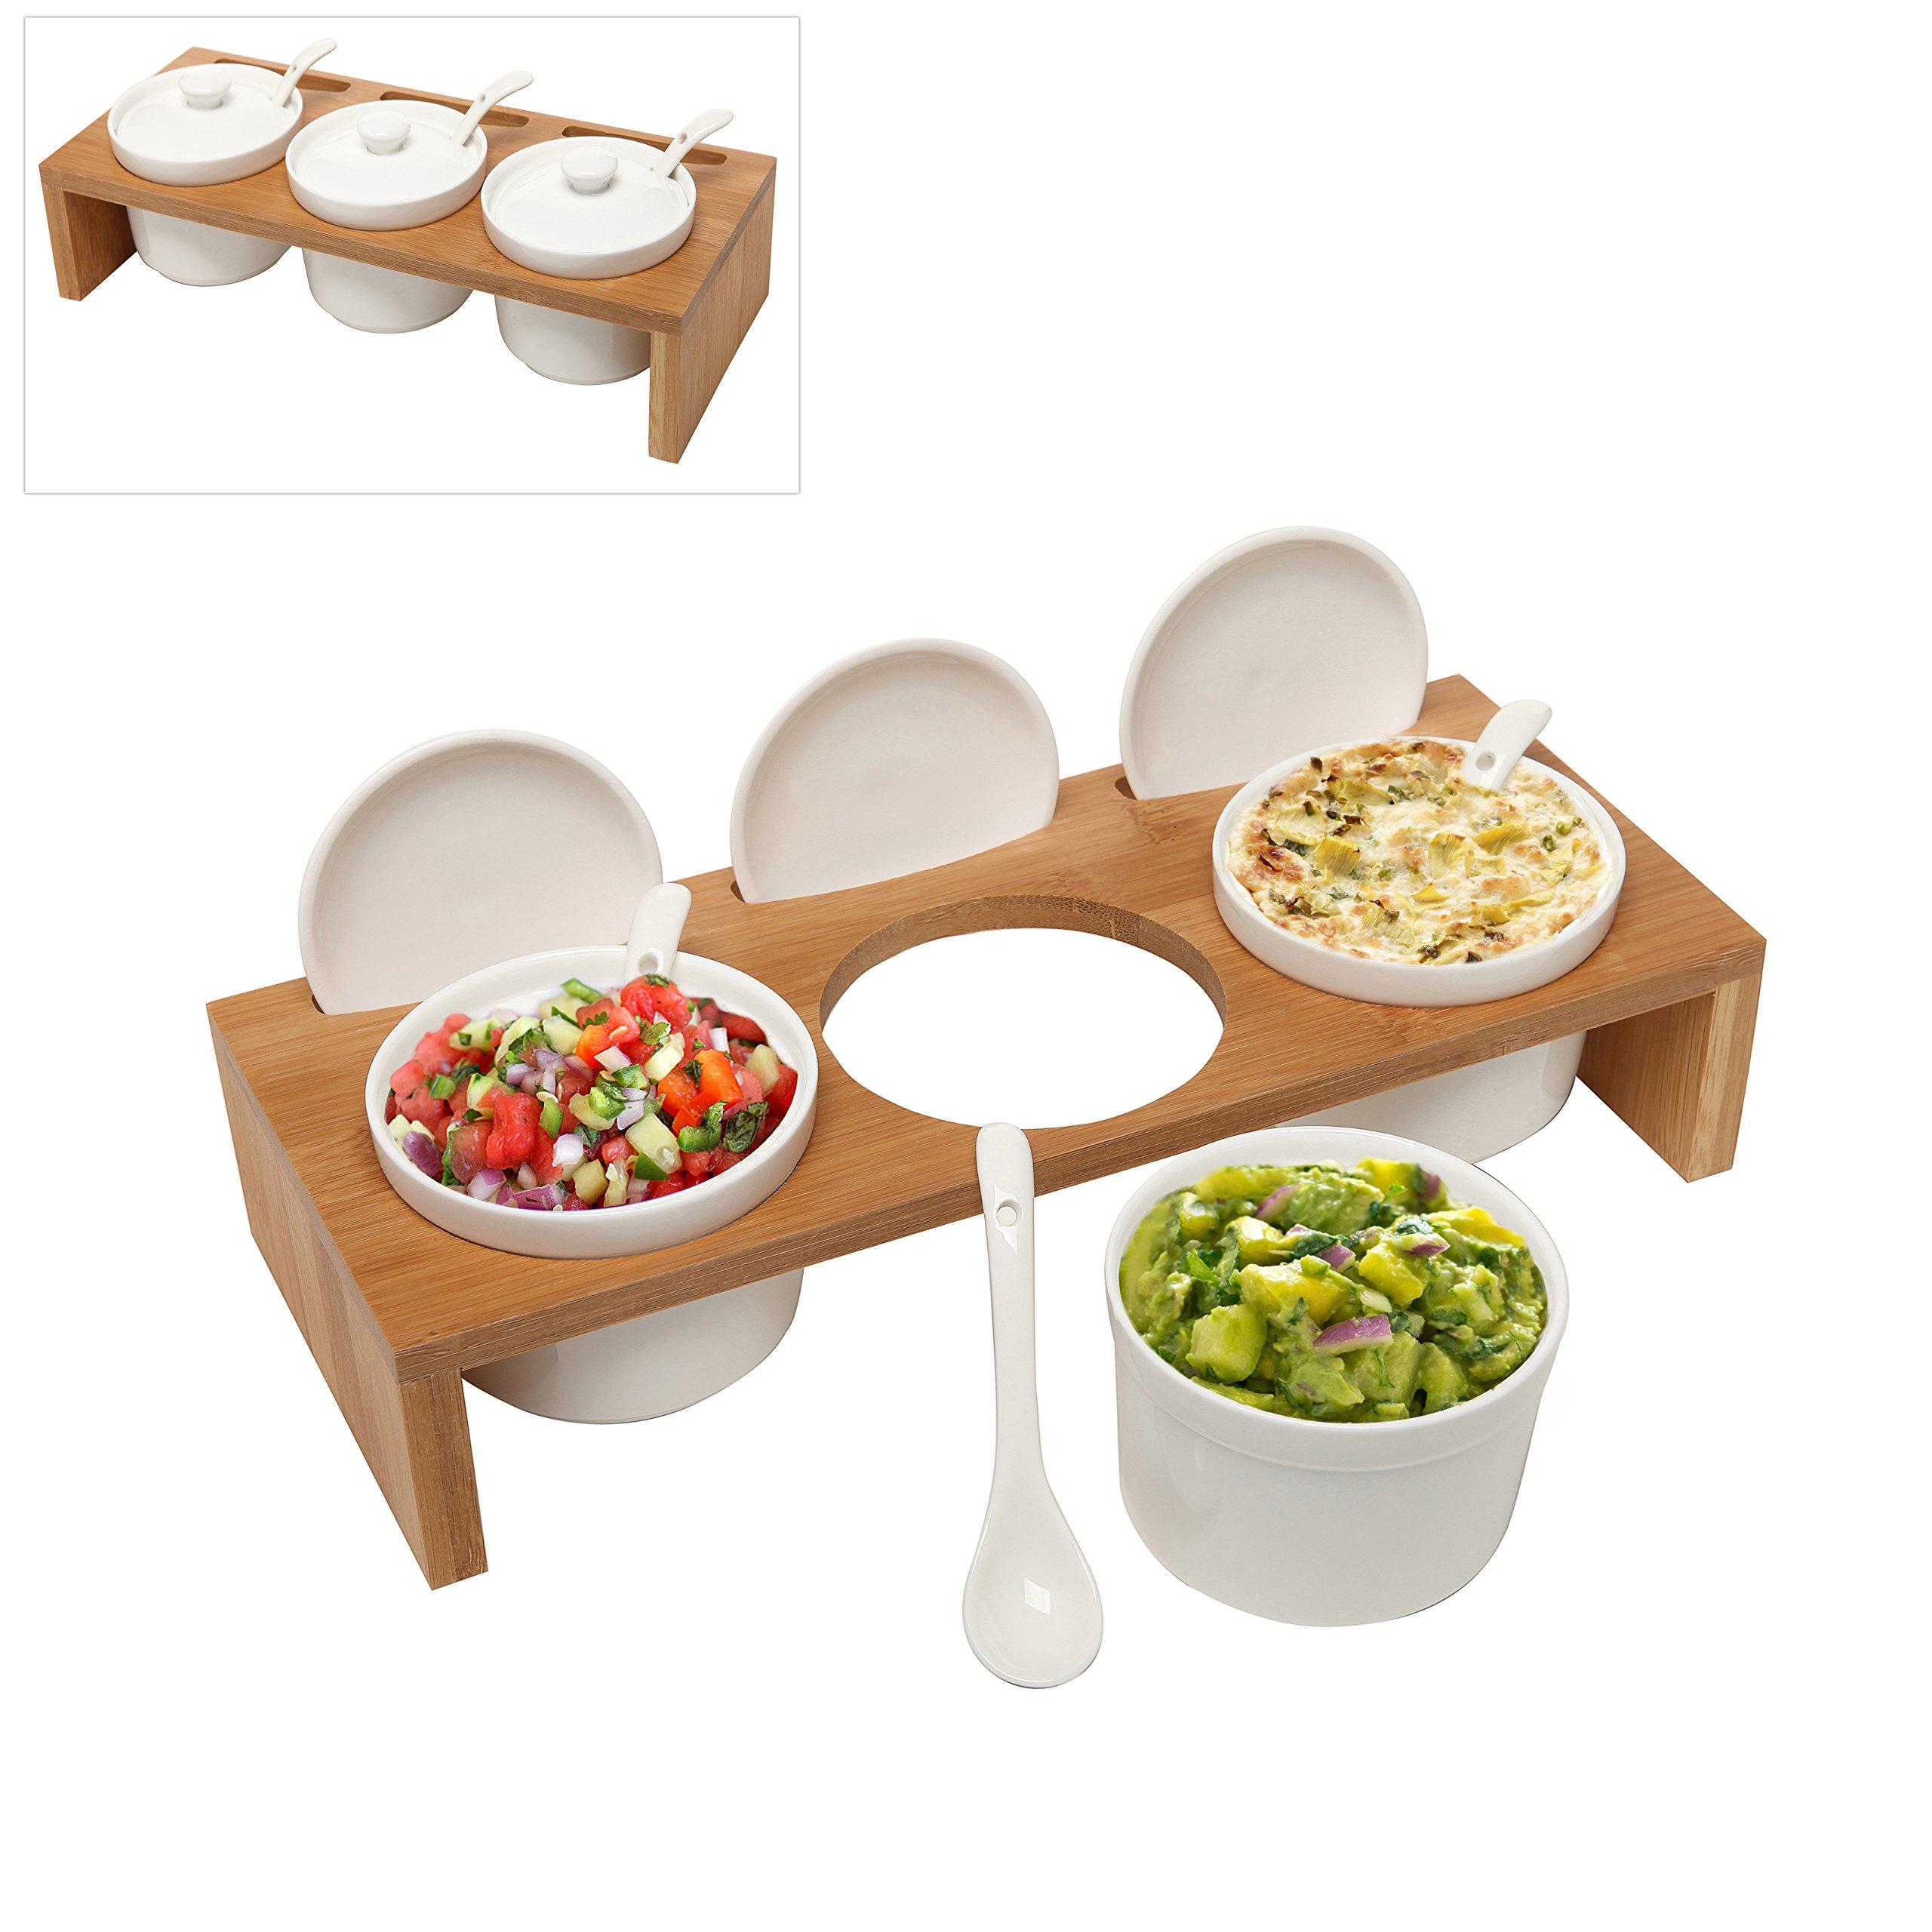 (3 Pcs) 3.5-Inch Ceramic Condiment Dip Sauce Ramekins Set w/ Lids & Spoons on Bamboo Sampler Serving Tray